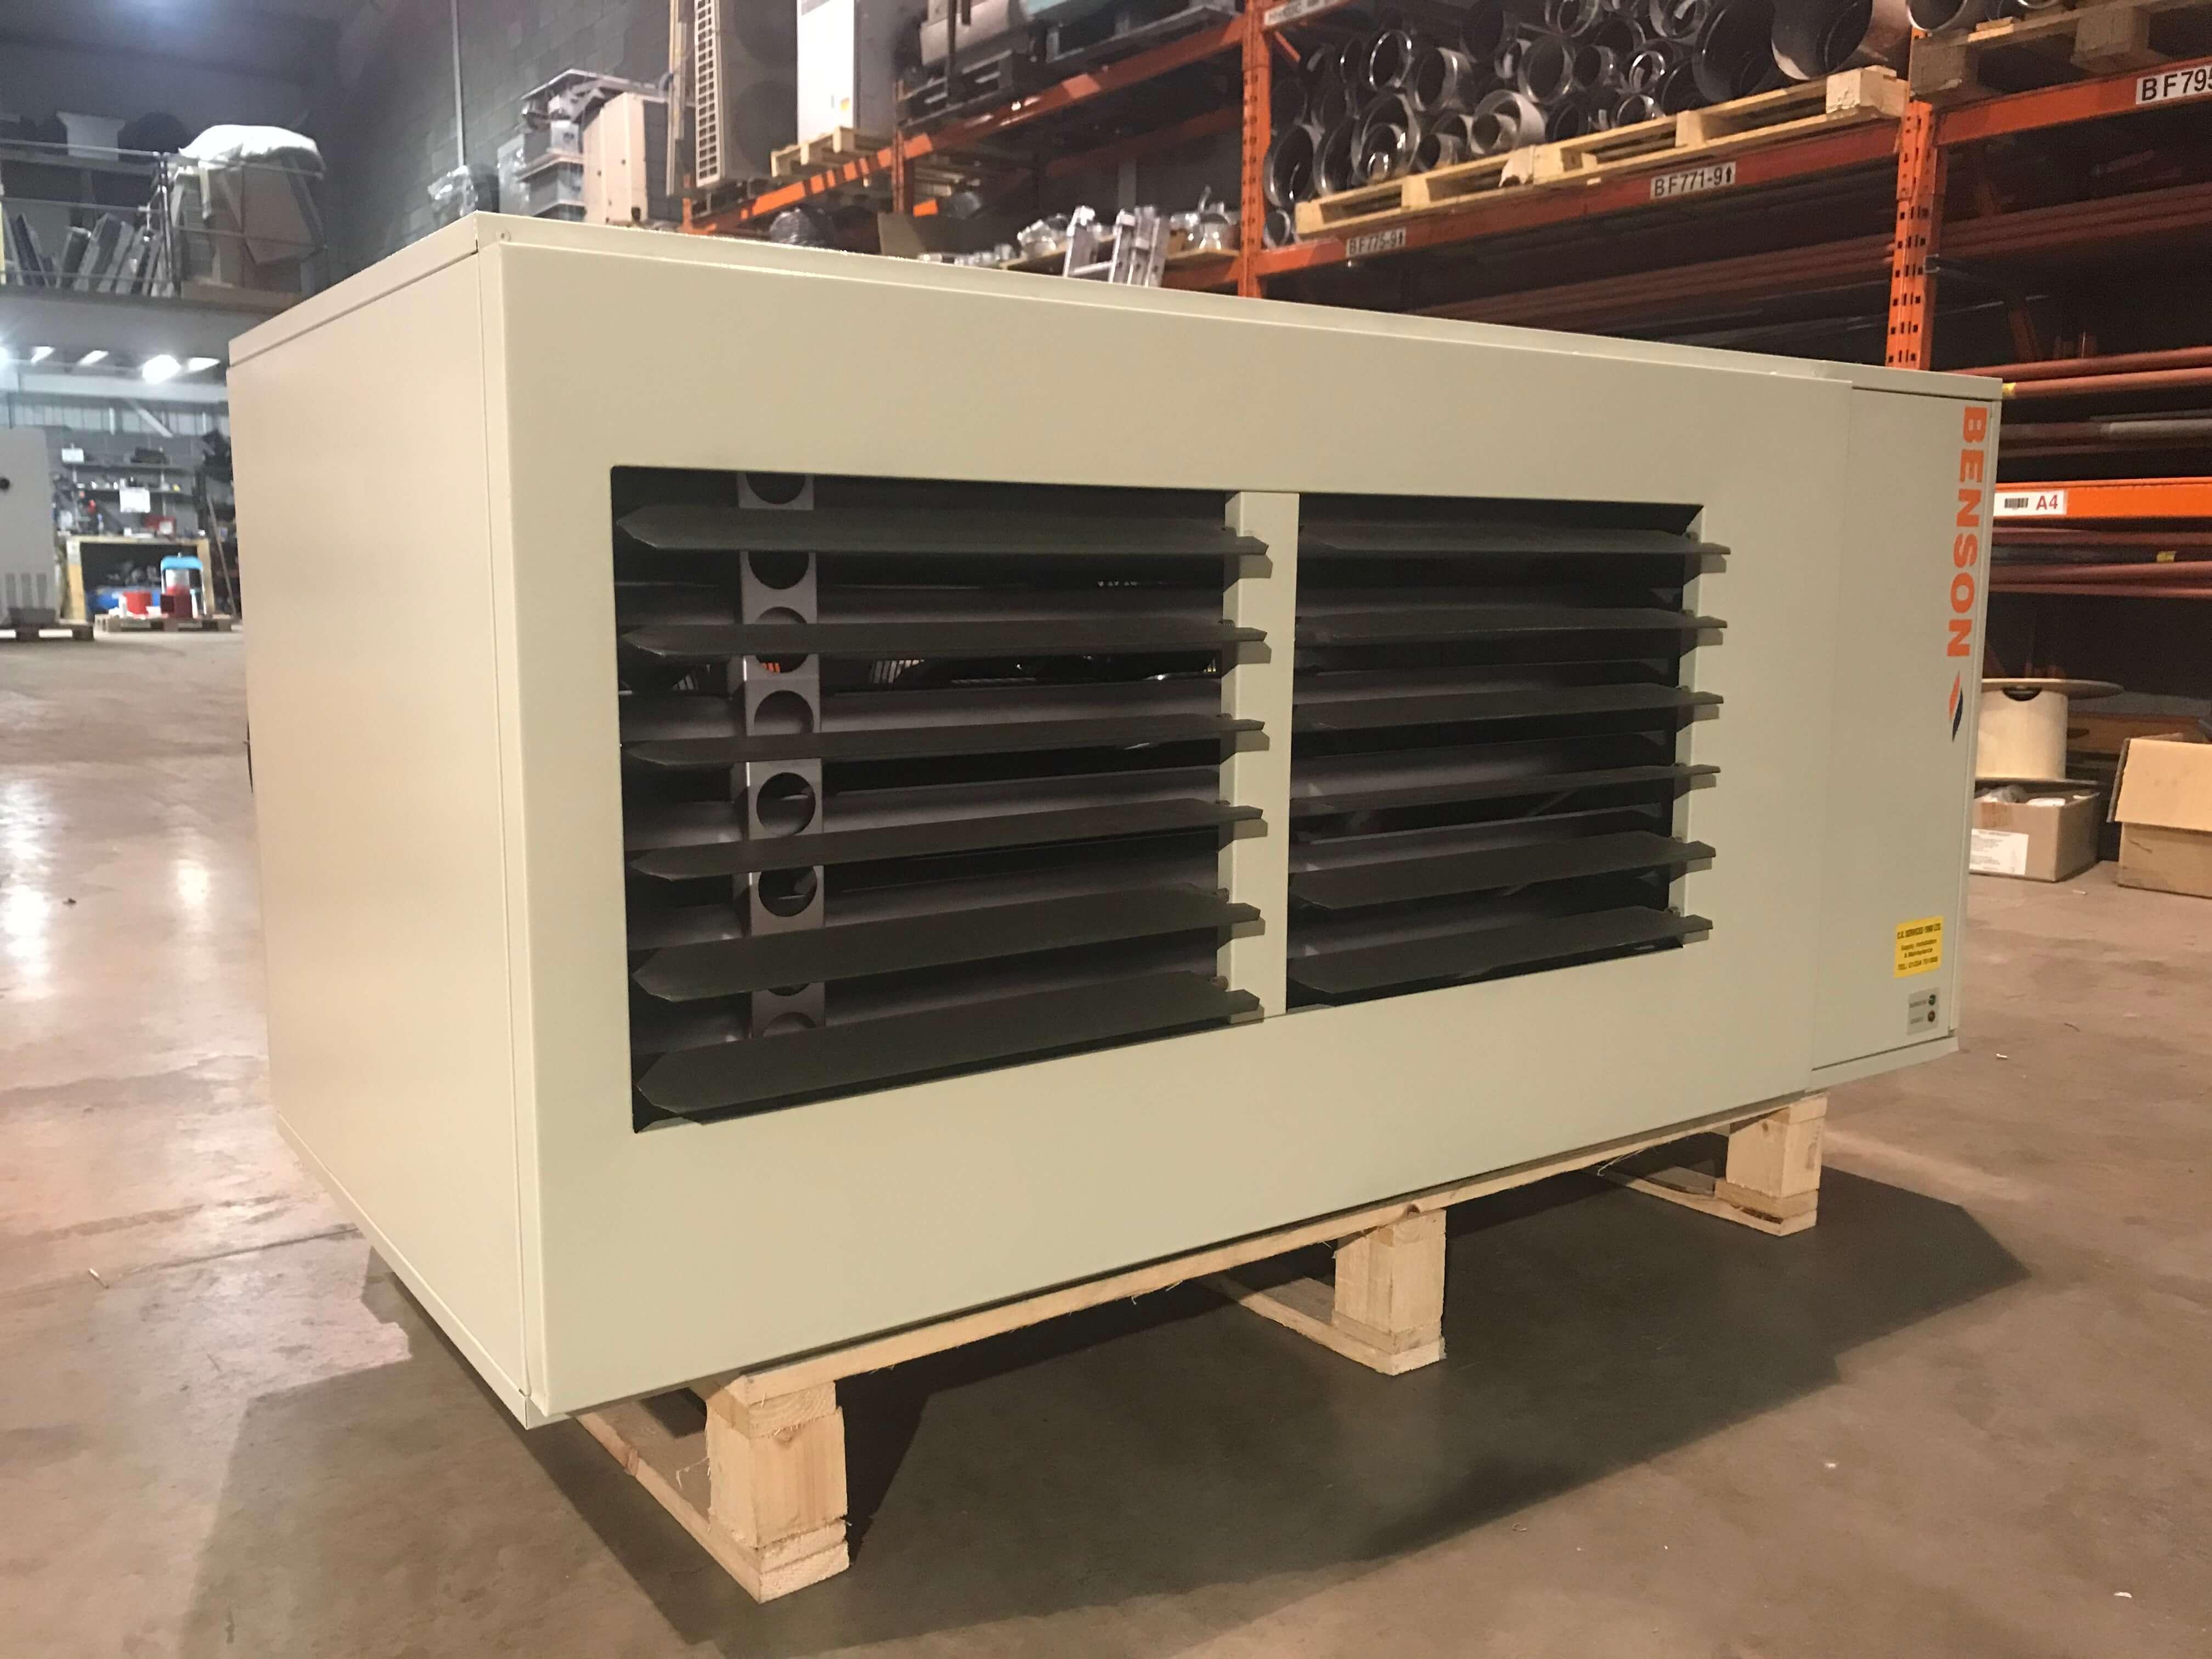 Benson VRA 95 Refurbished Suspended gas heater (1)